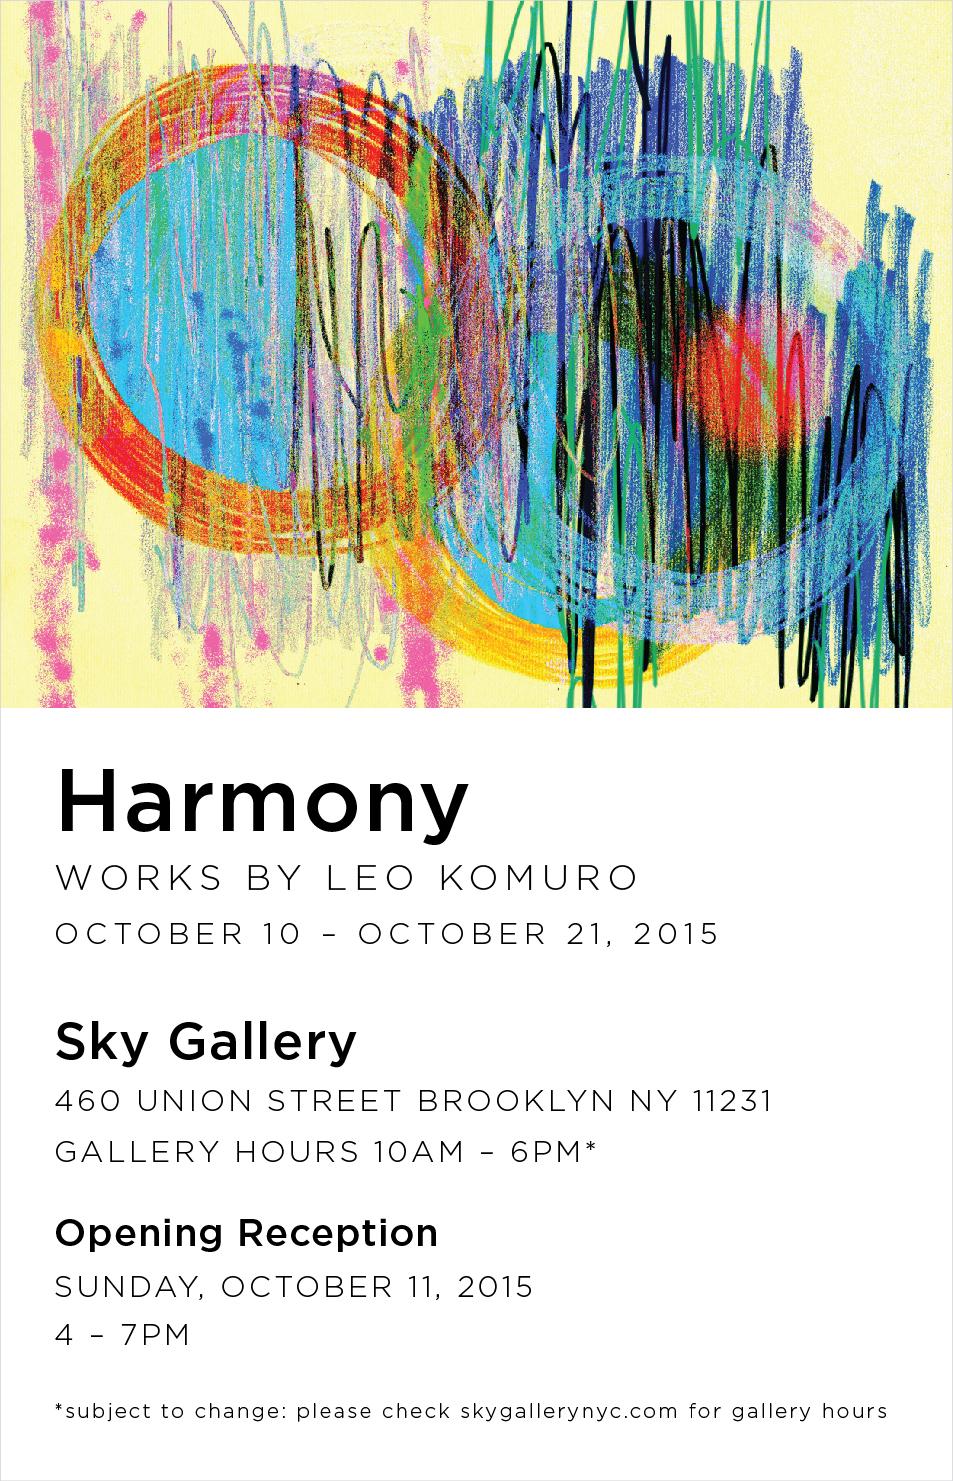 Sky Gallery Harmony Leo Komuro